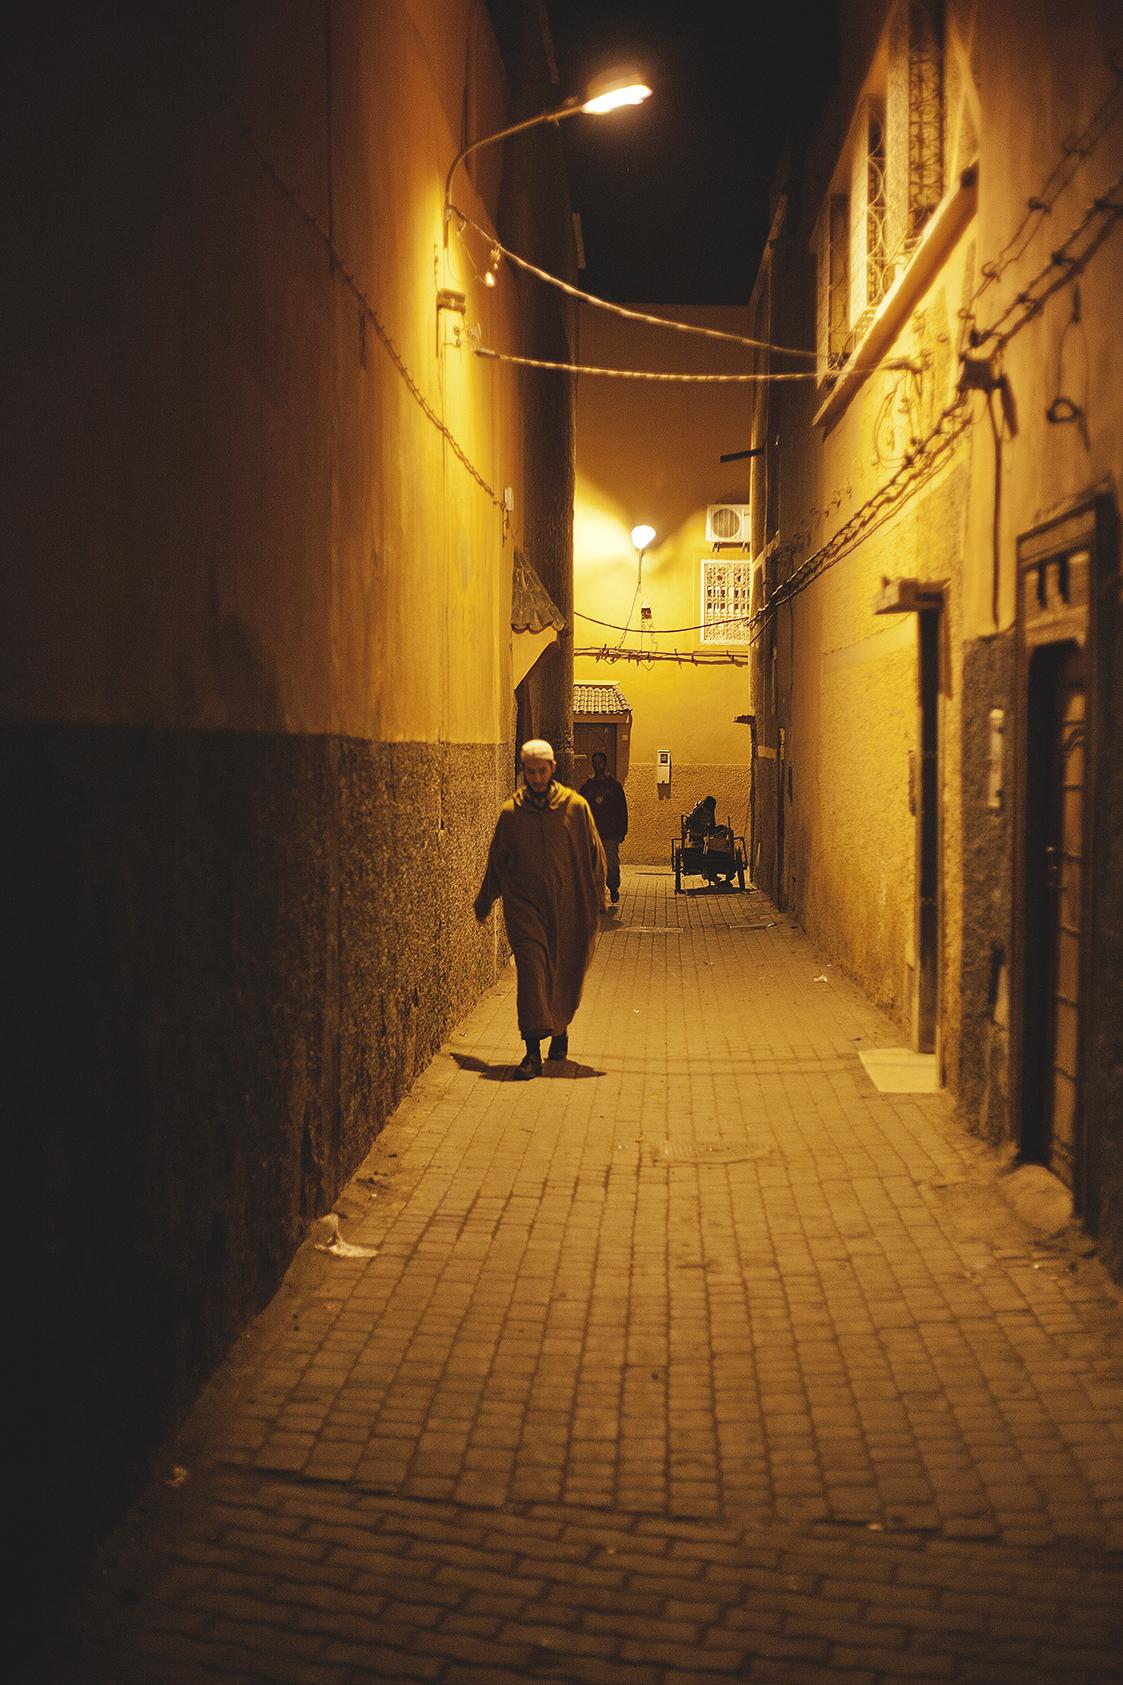 marrakesh-back-alley-at-night-travel-photographer.jpg